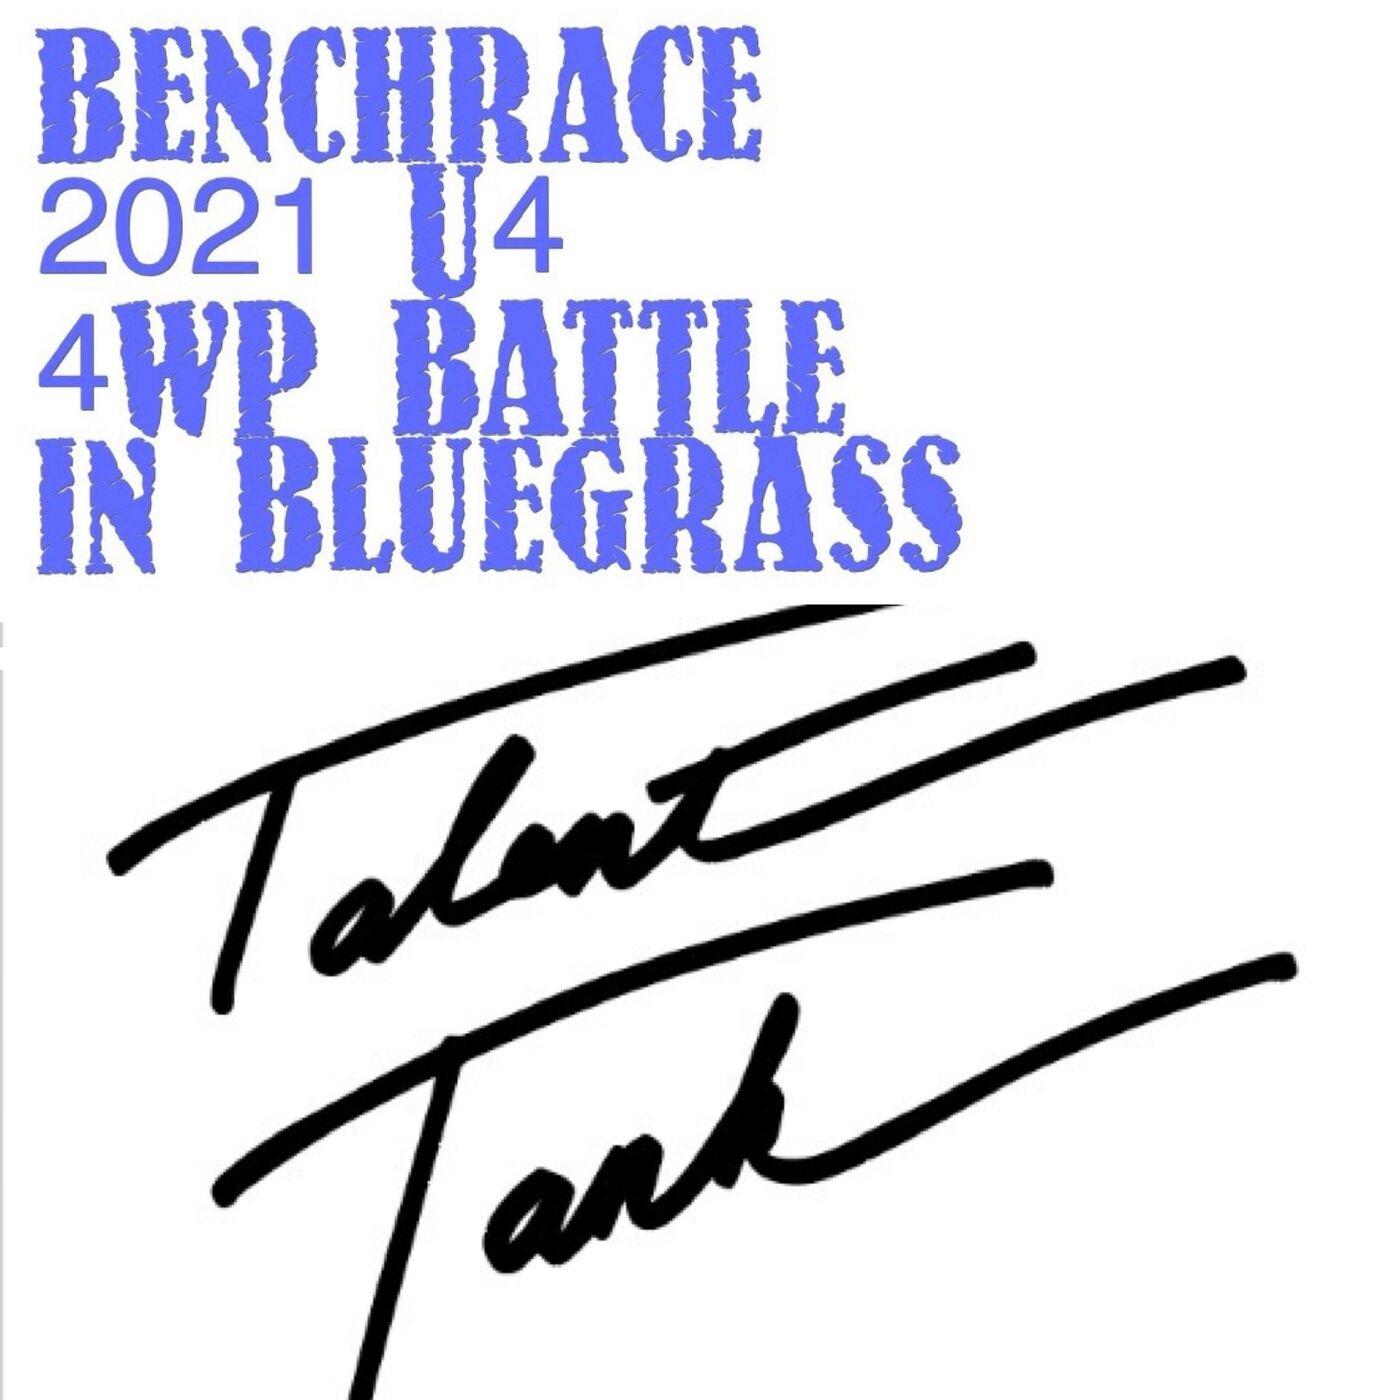 SP 15 Benchracing 2021 U4 Battle in BlueGrass from Rush, Kentucky